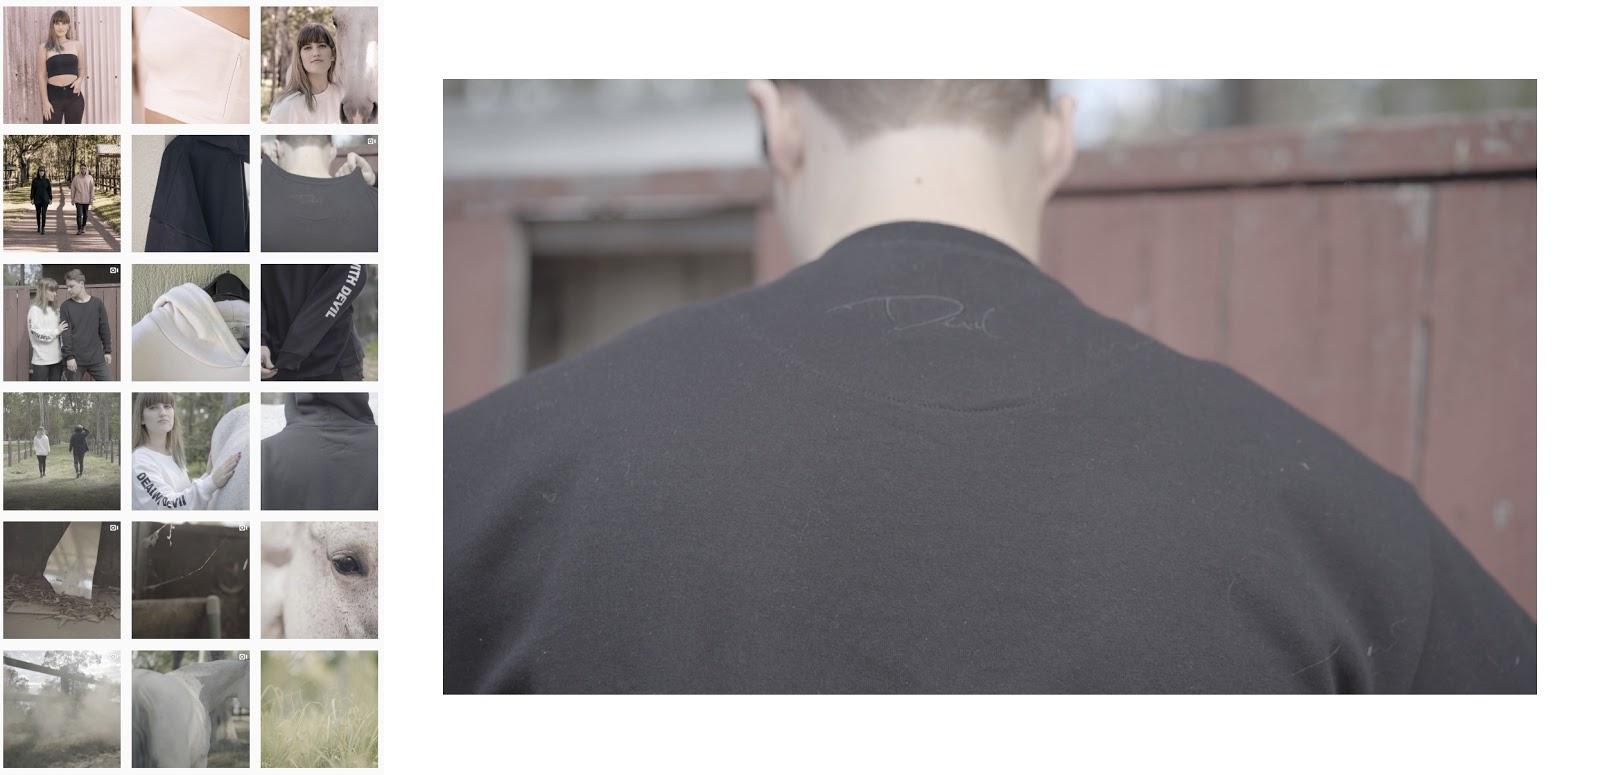 how-i-left-my-tech-studies-to-start-a-luxury-streetwear-brand